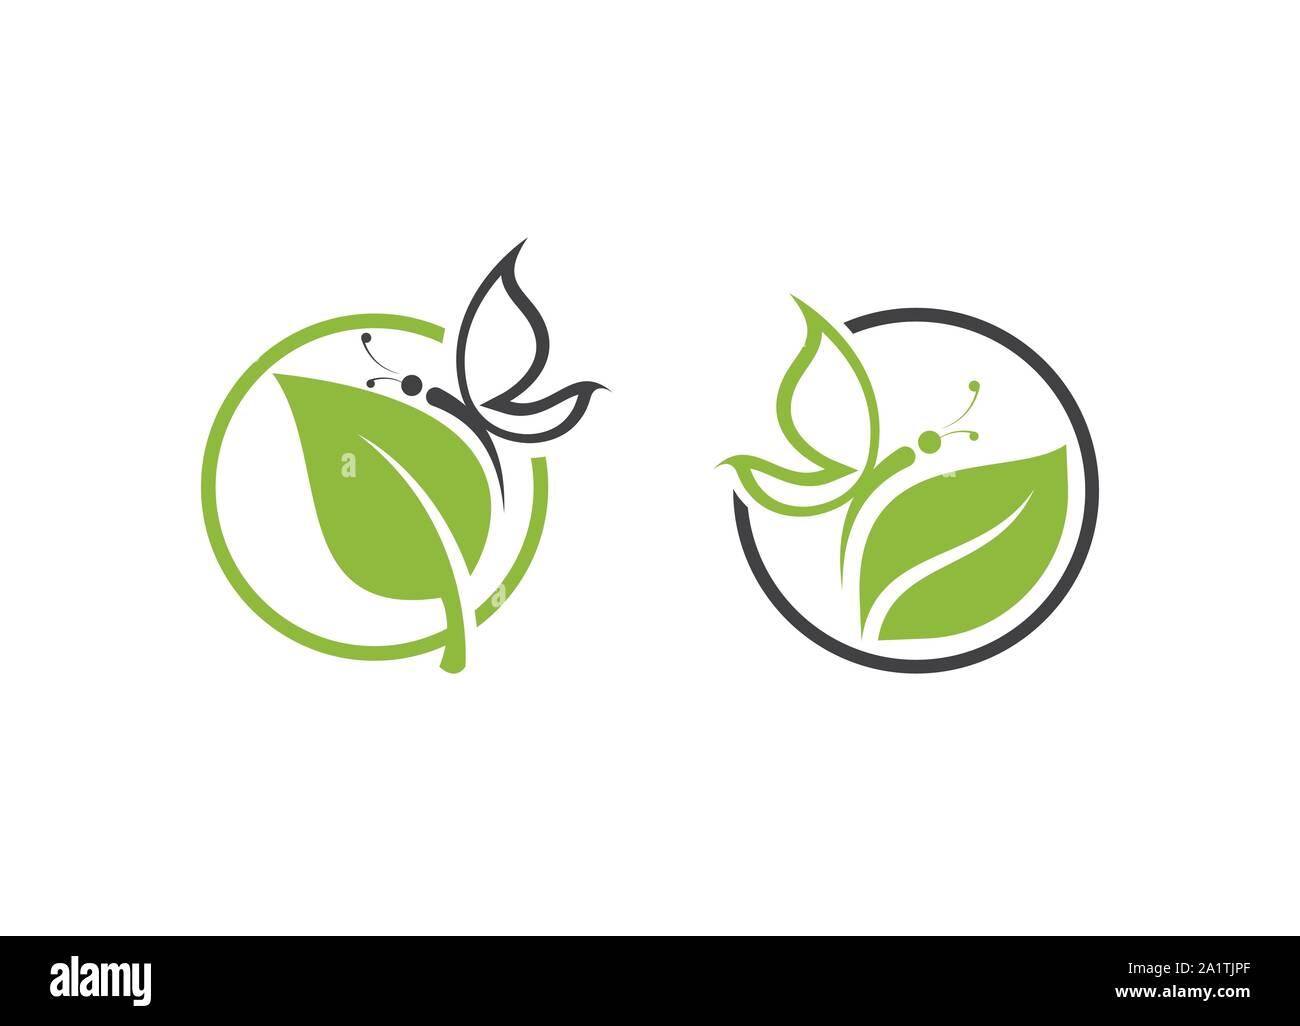 Spa Therapy Logo Concept Woman Beauty Hair Salon Logo Design Beauty Spa Logo Template Women Health And Wellness Vector Logo Design Template Stock Vector Image Art Alamy